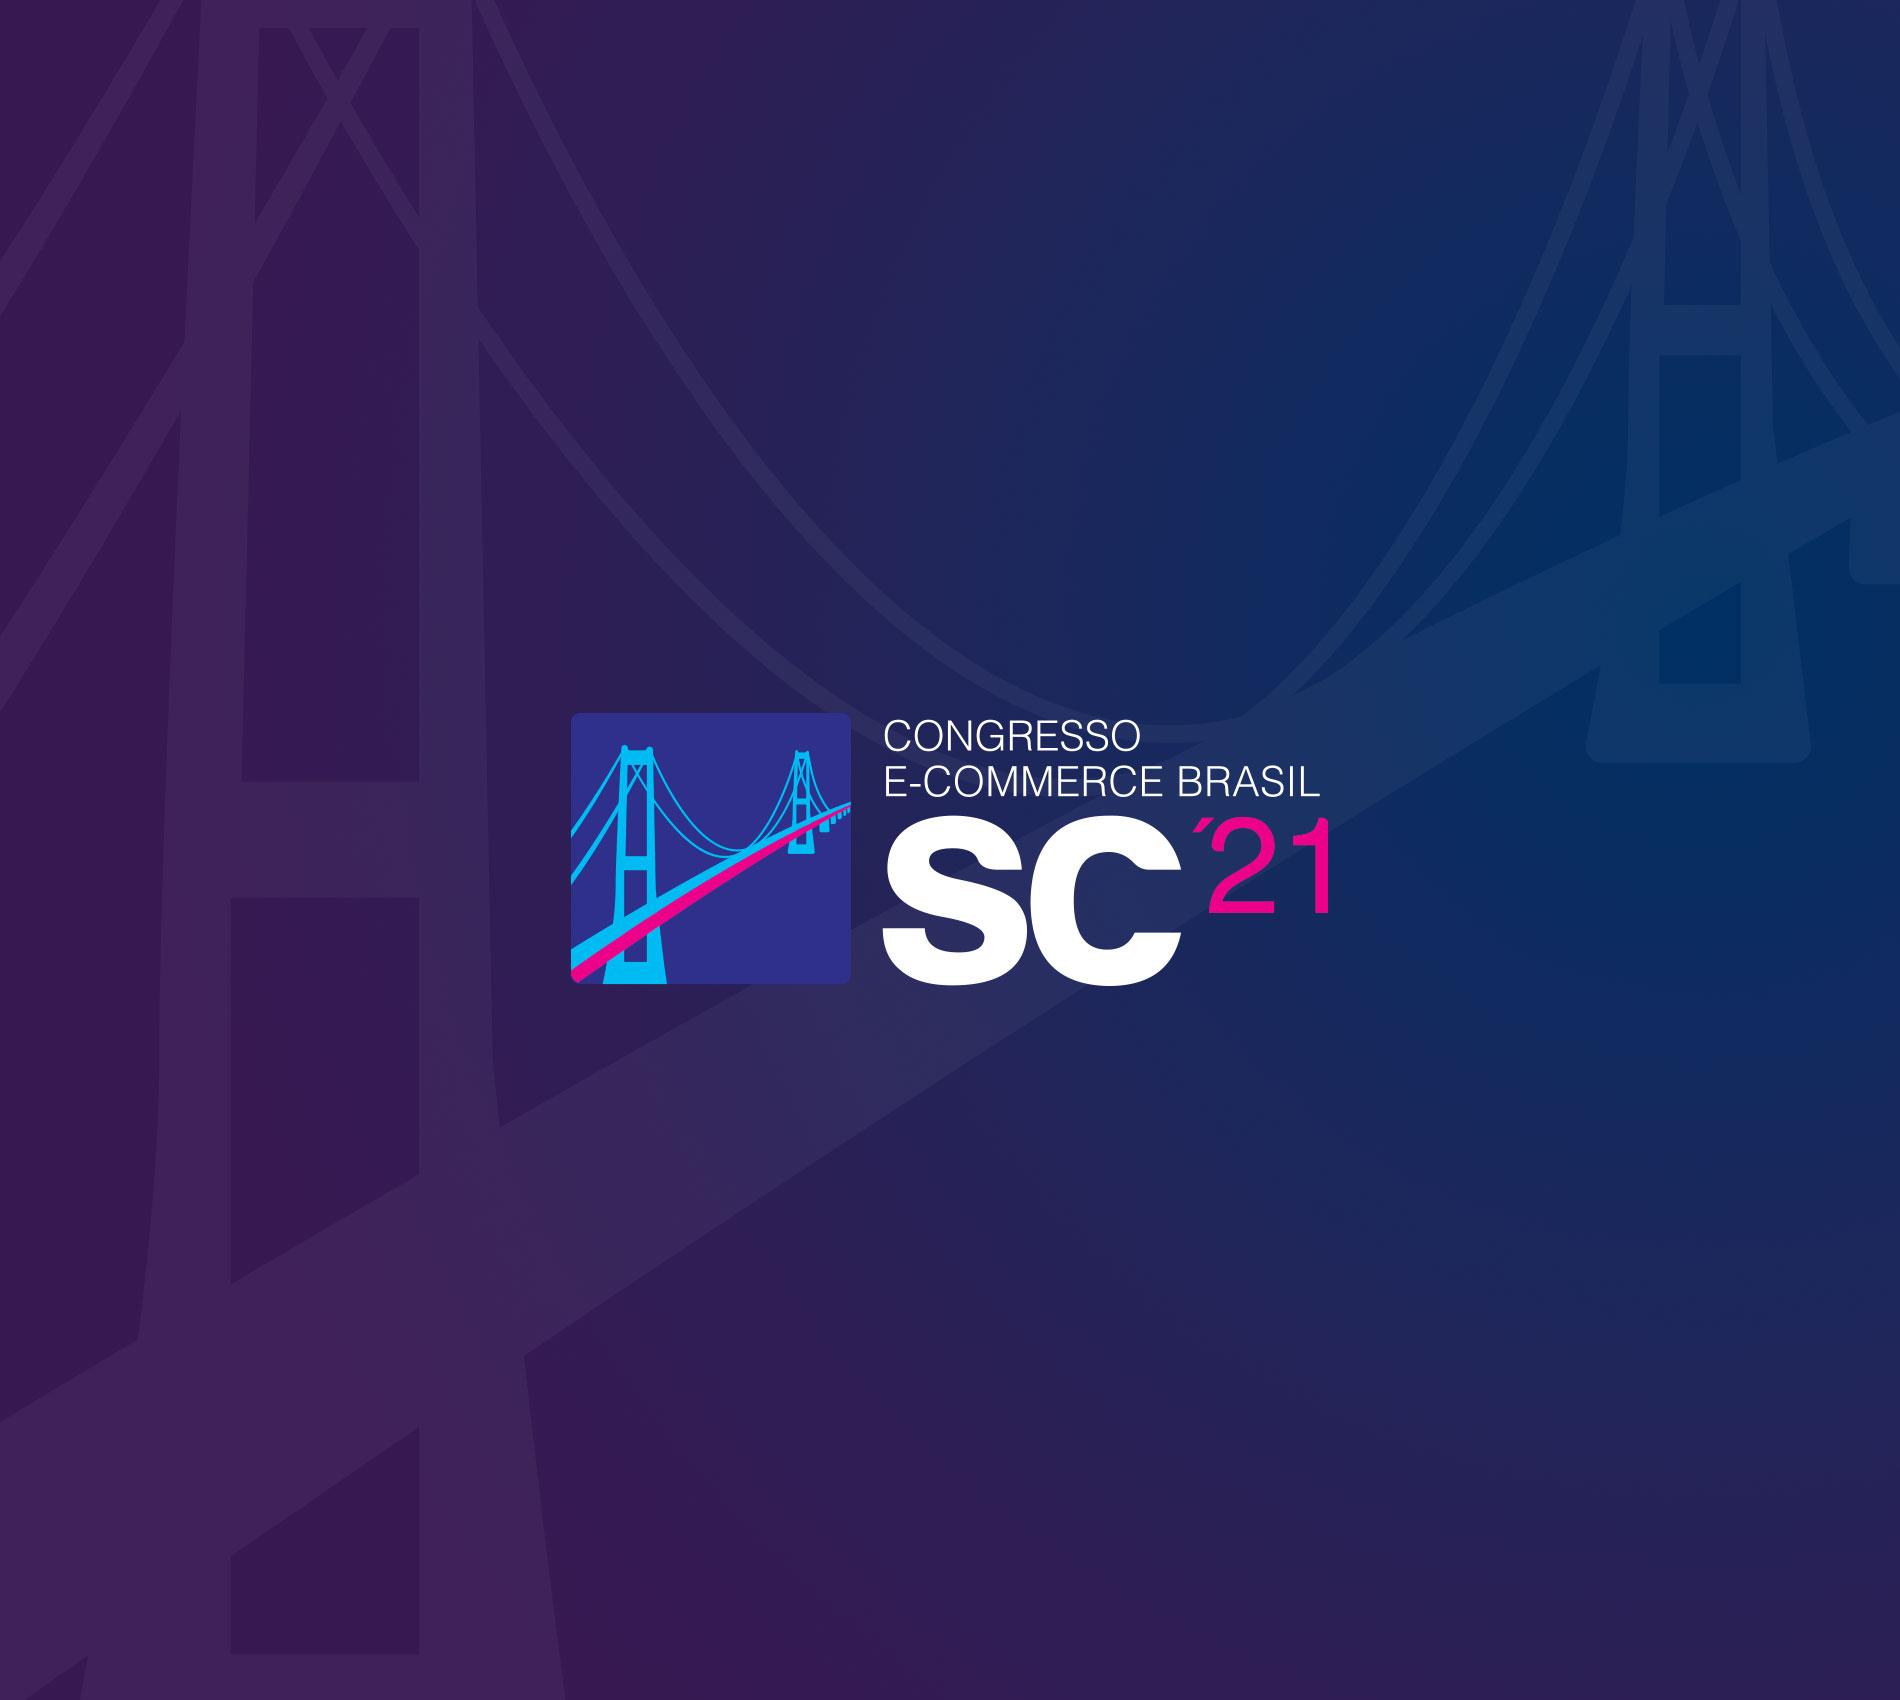 Conferência E-commerce Brasil SC 2021